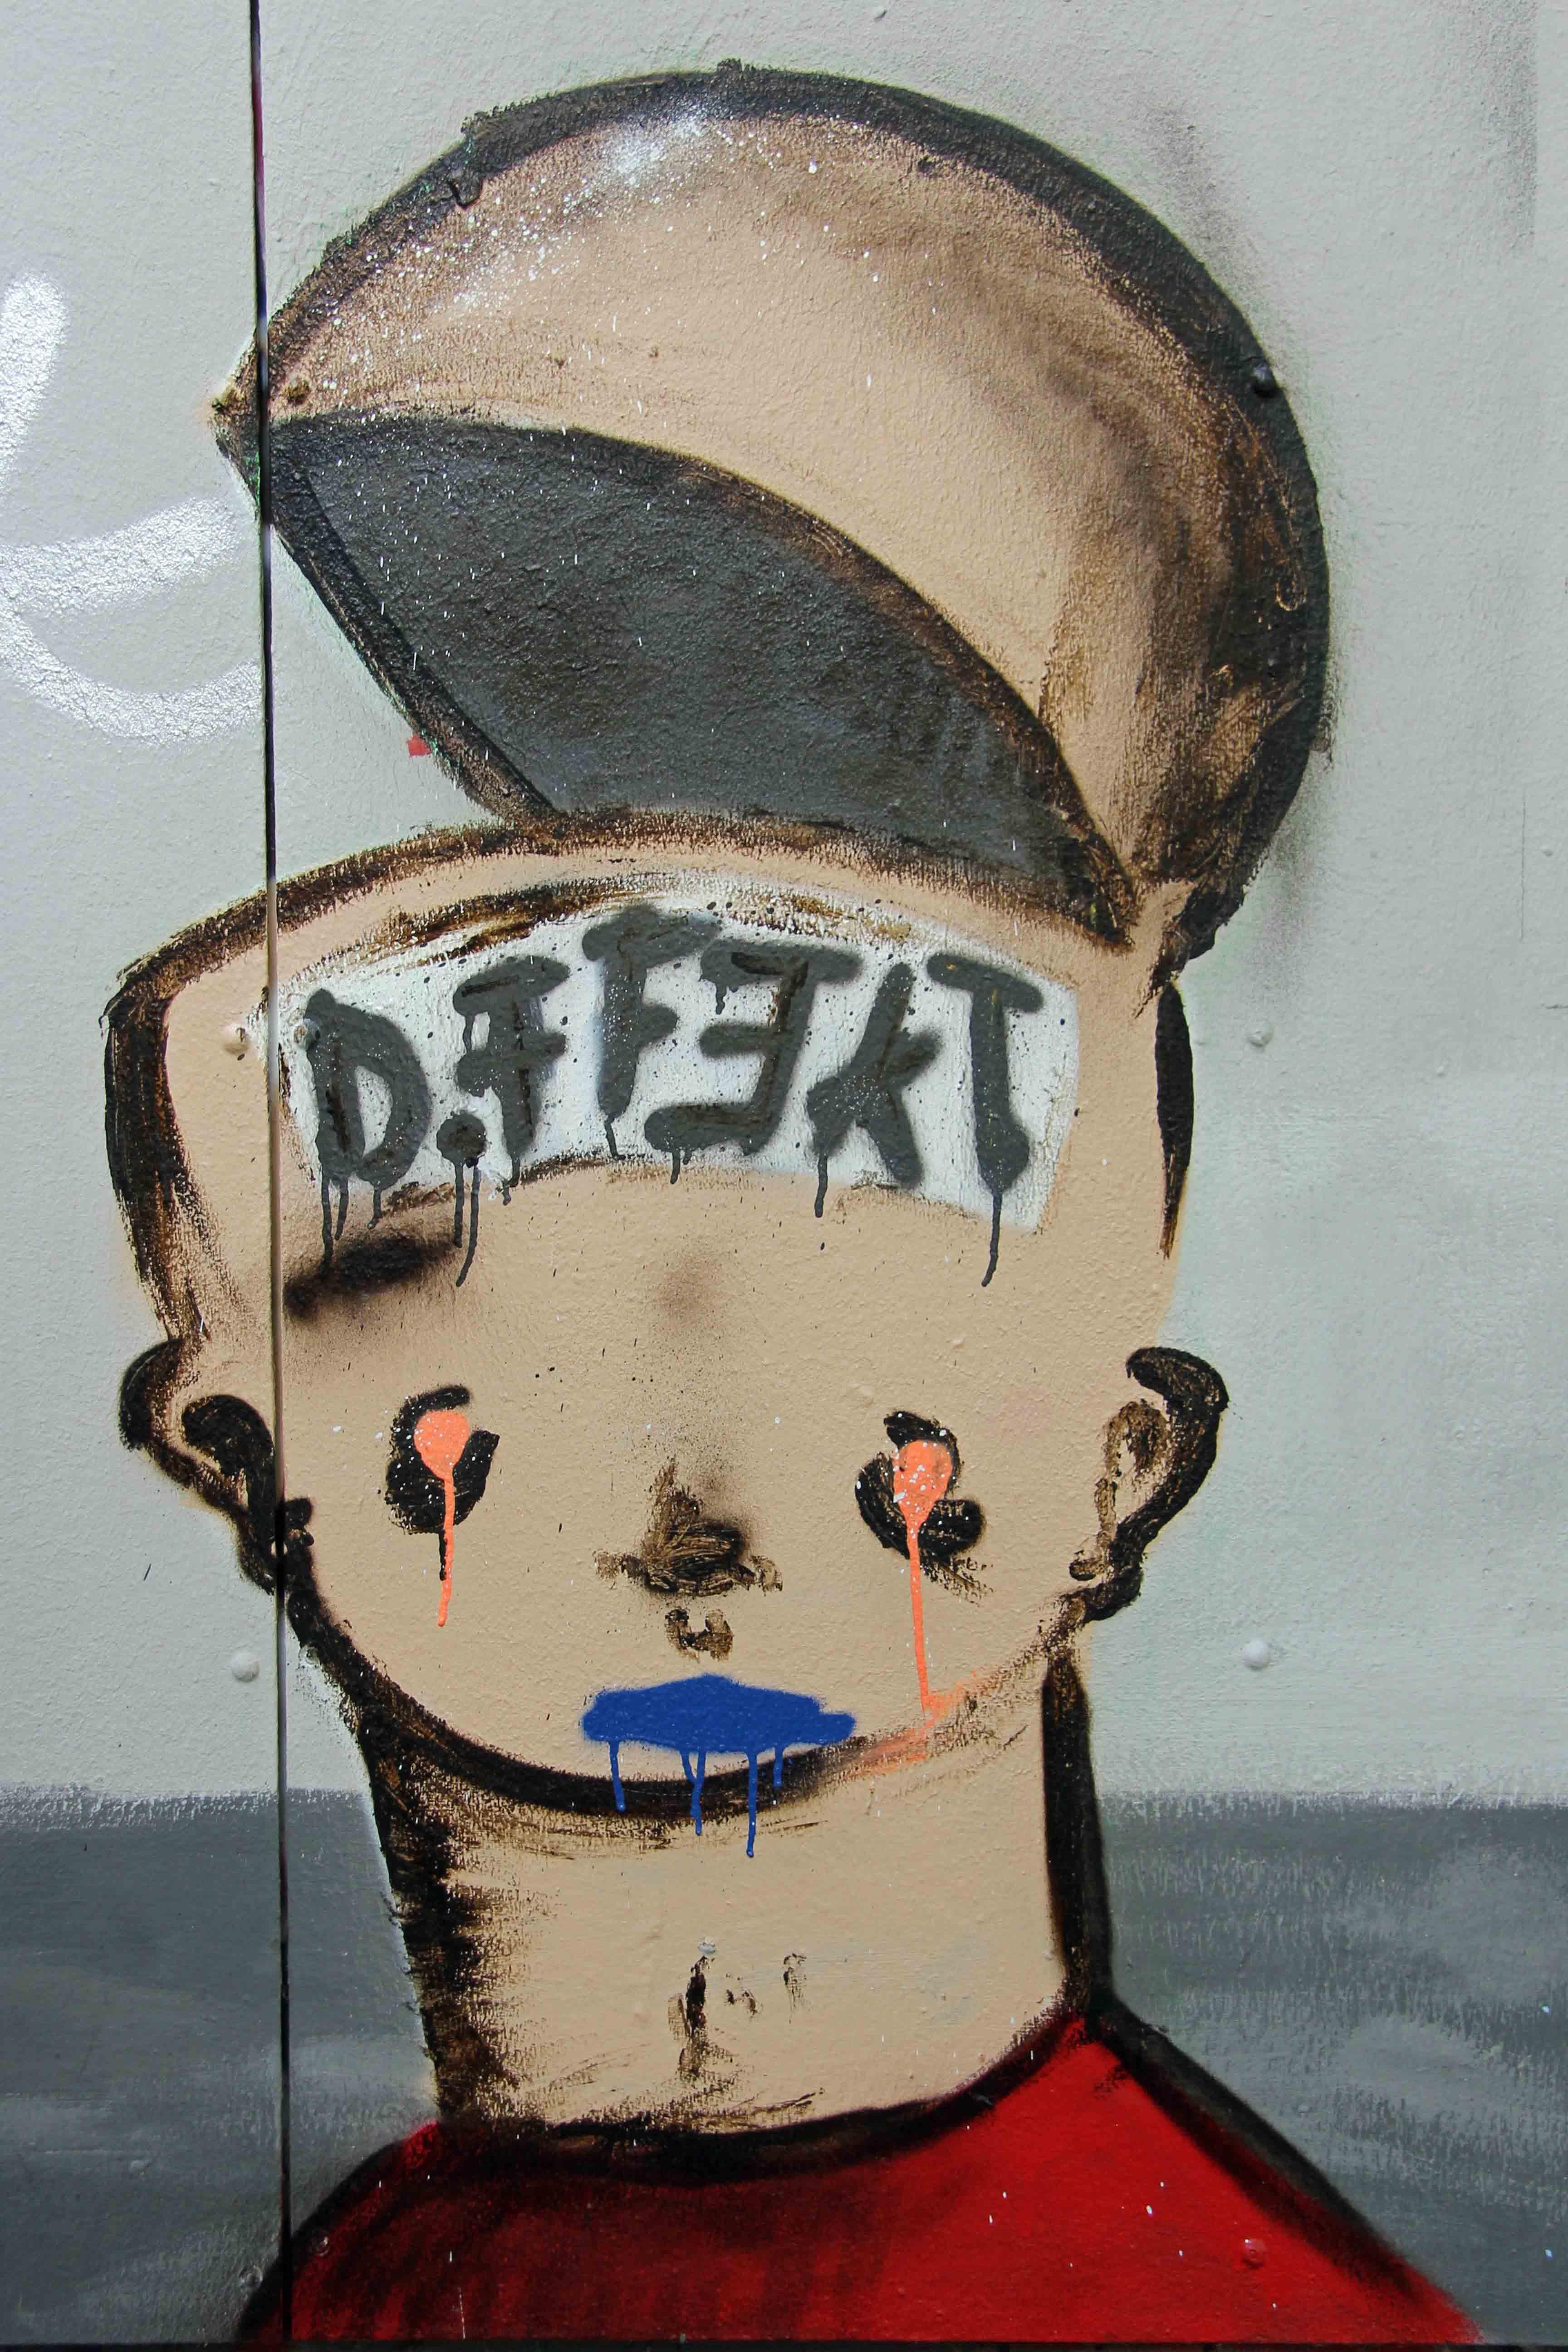 Hinged Mind - Street Art by Unknown Artist in Berlin